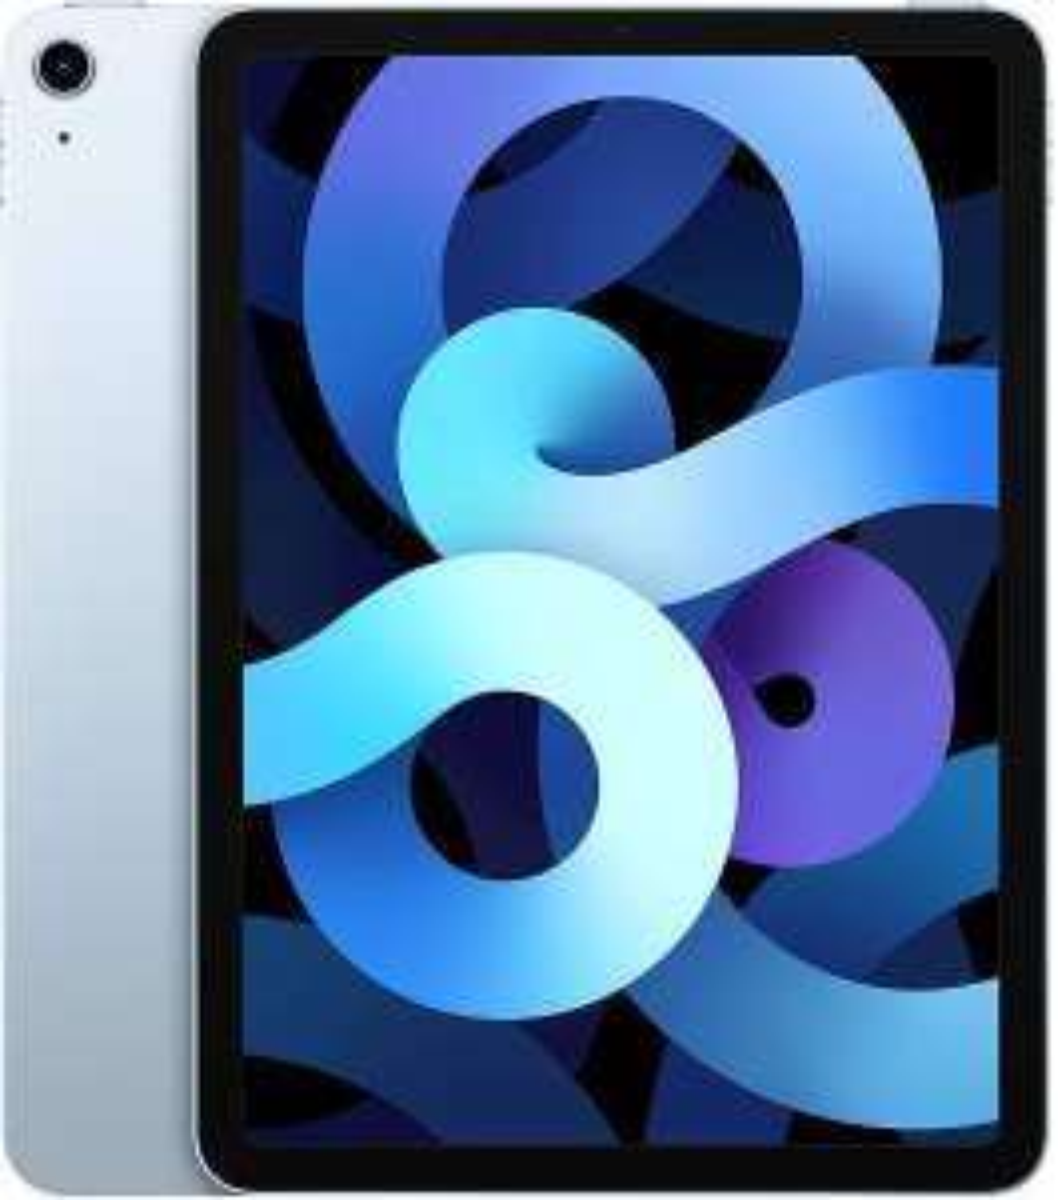 Apple iPad Air 2020 (4. Generation) 64GB WiFi Sky Blue [Electronis über Check24]